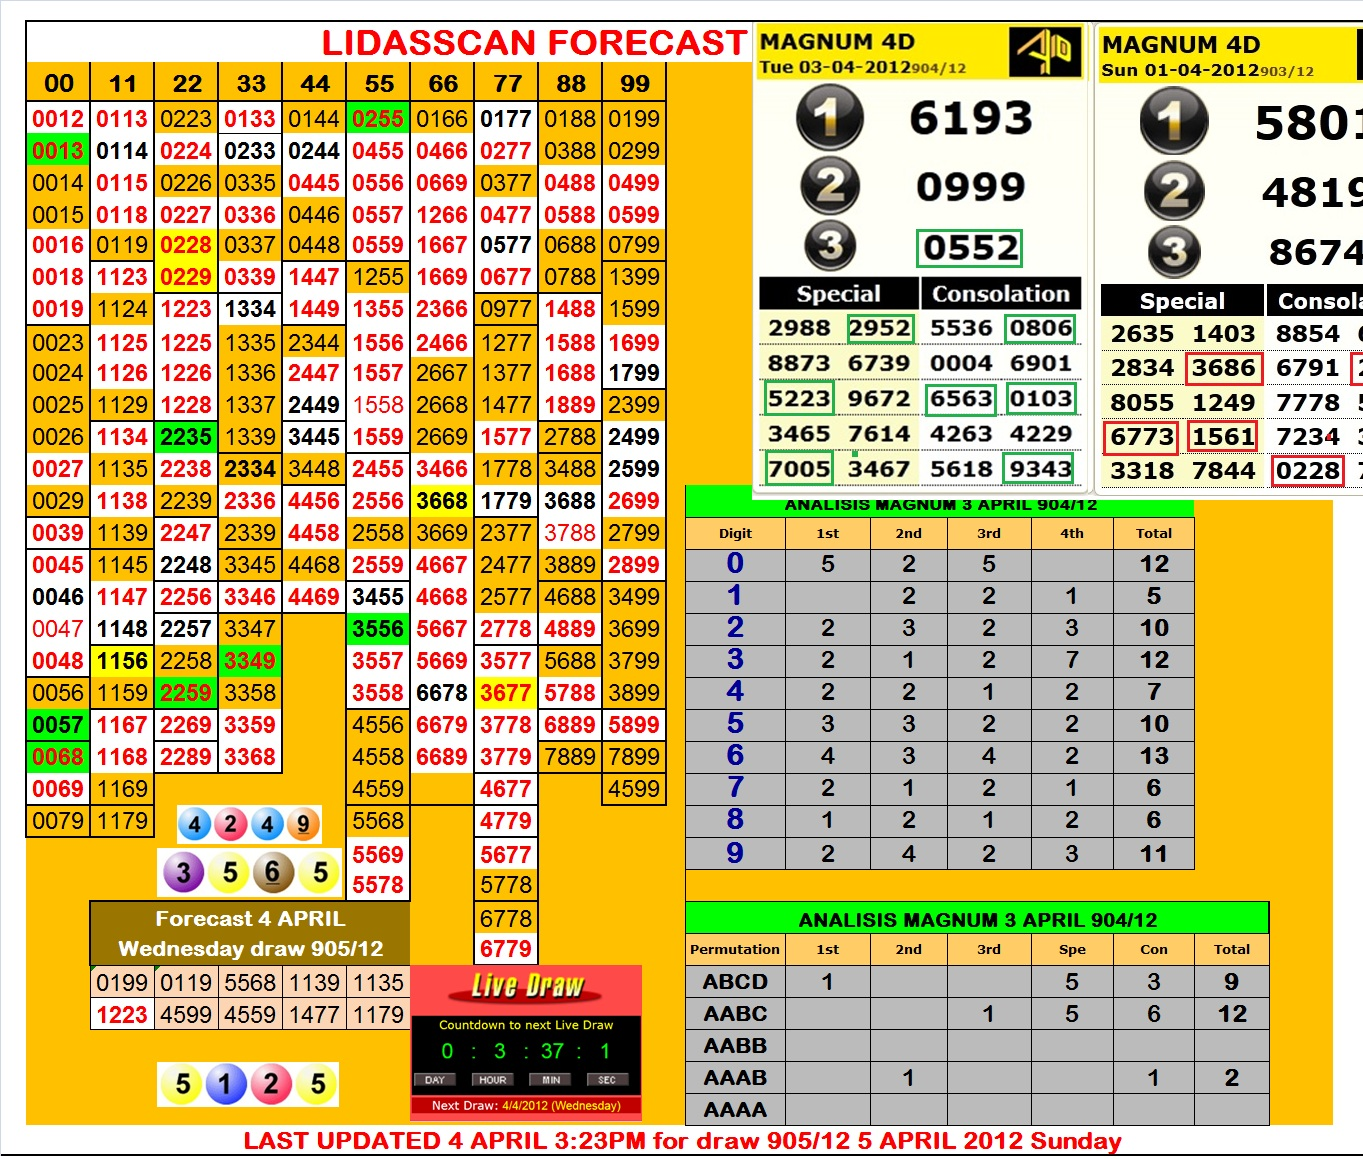 Forecast lidasscan forecast 4 april magnum draw 905 12 4 april 2012 - Vetrocamera 4 12 4 ...